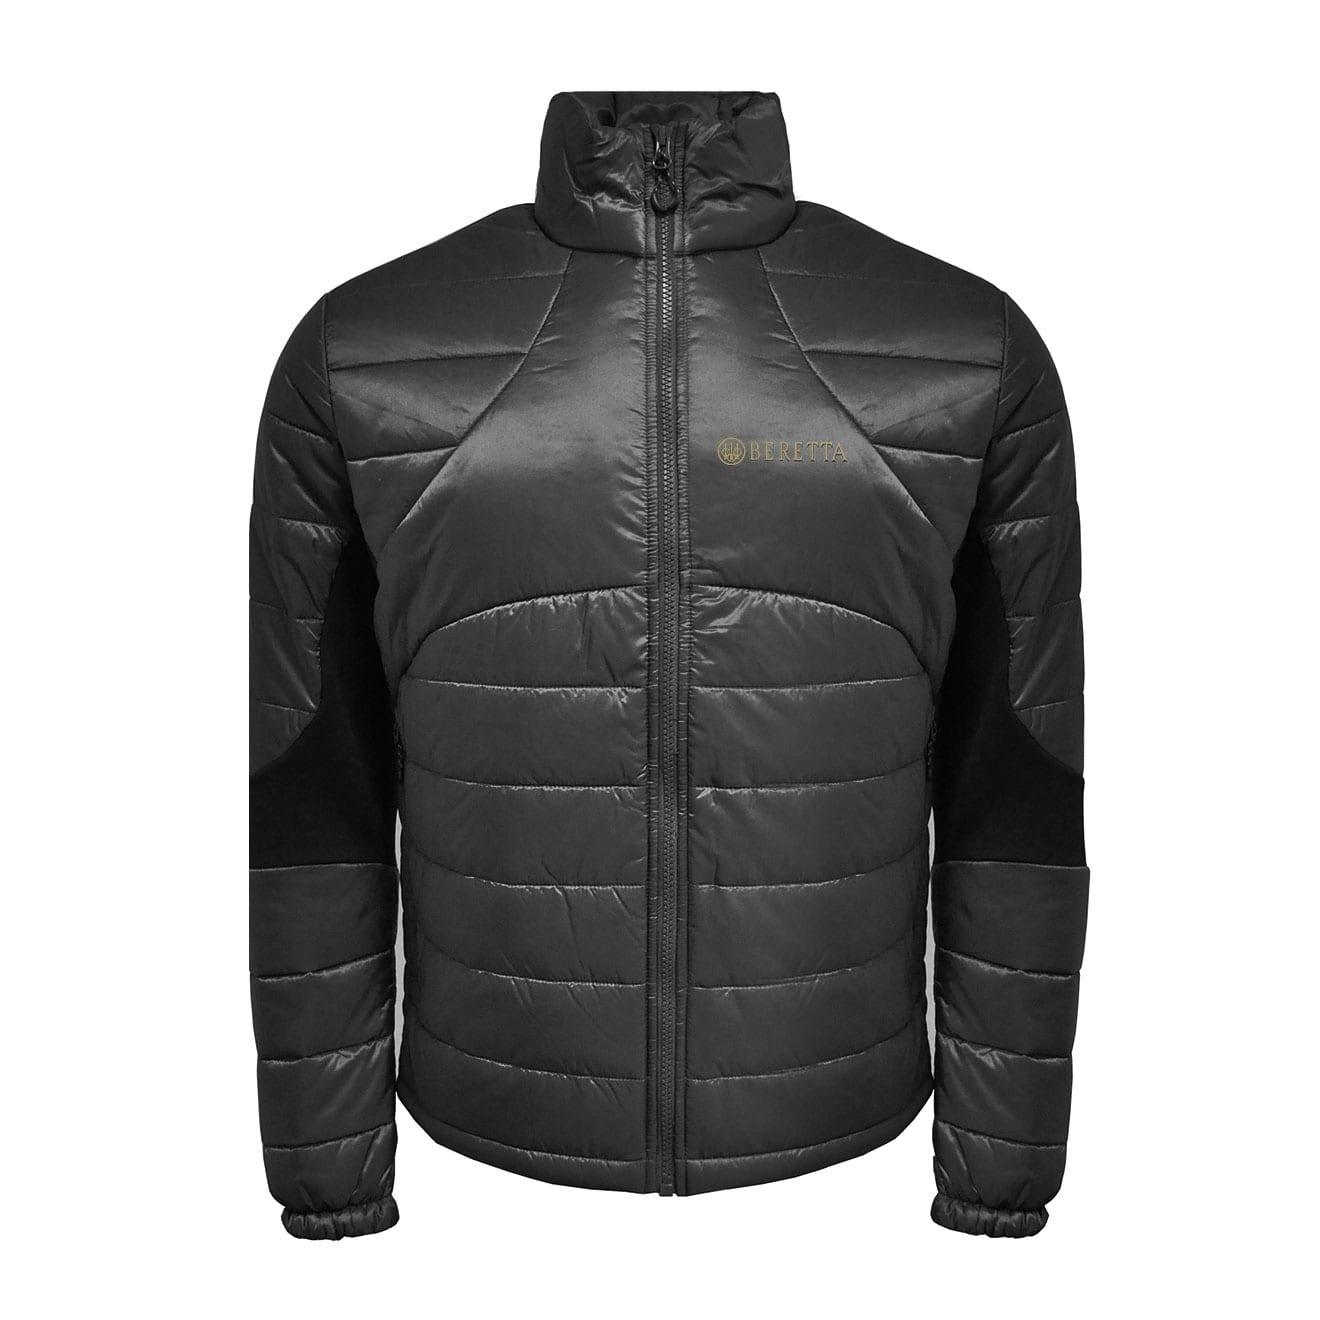 Beretta Warmbis Jacket Black